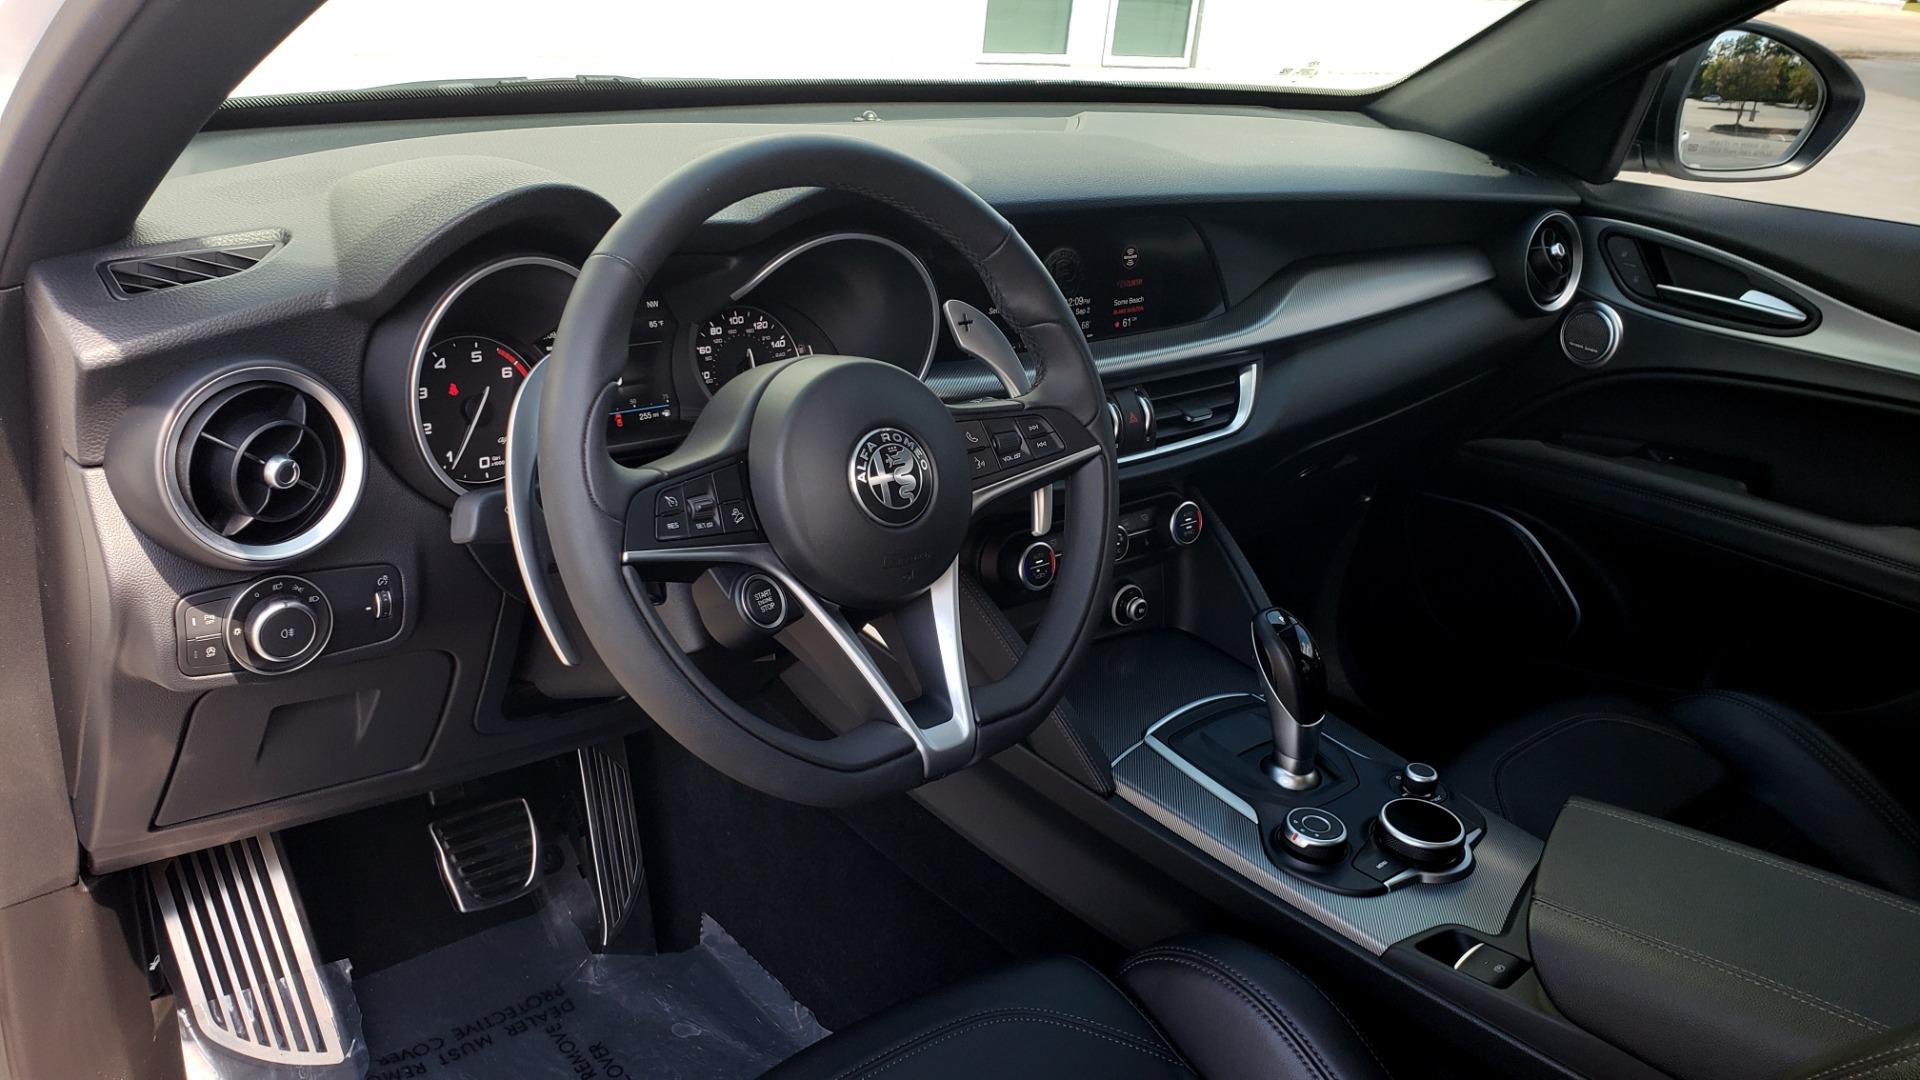 Used 2019 Alfa Romeo STELVIO TI SPORT AWD / 2.0L TURBO / 8-SPD AUTO / DRVR ASST / REARVIEW for sale $37,495 at Formula Imports in Charlotte NC 28227 42